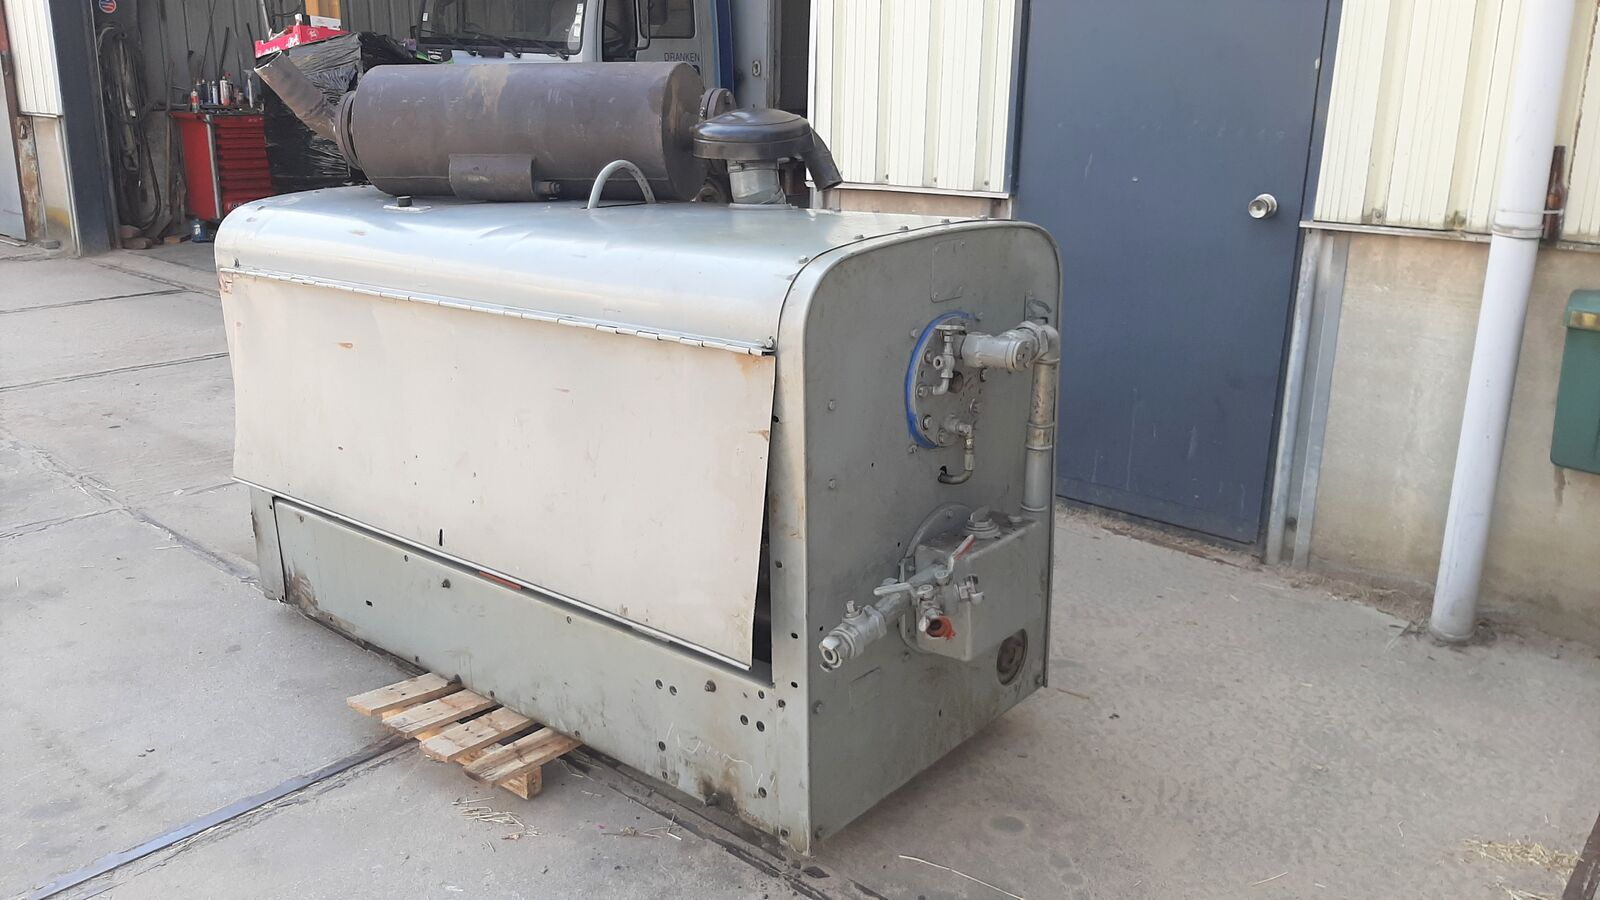 kompresor INGERSOLL RAND DR140 / 6481 hrs